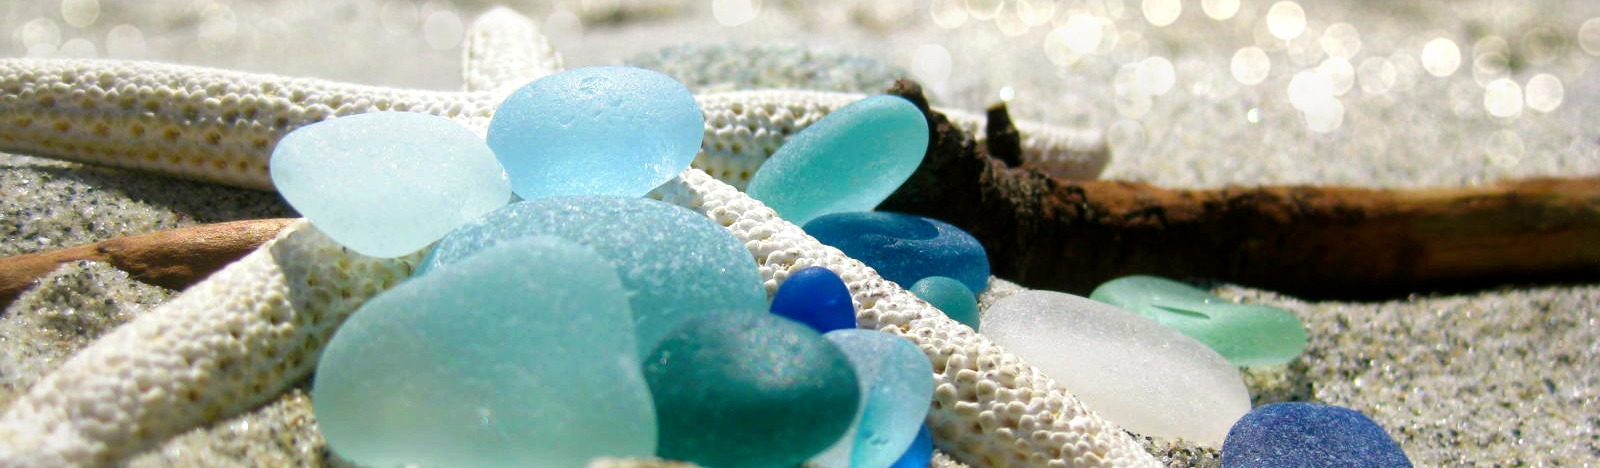 rare-sea-glass-gems-with-starfish.jpg